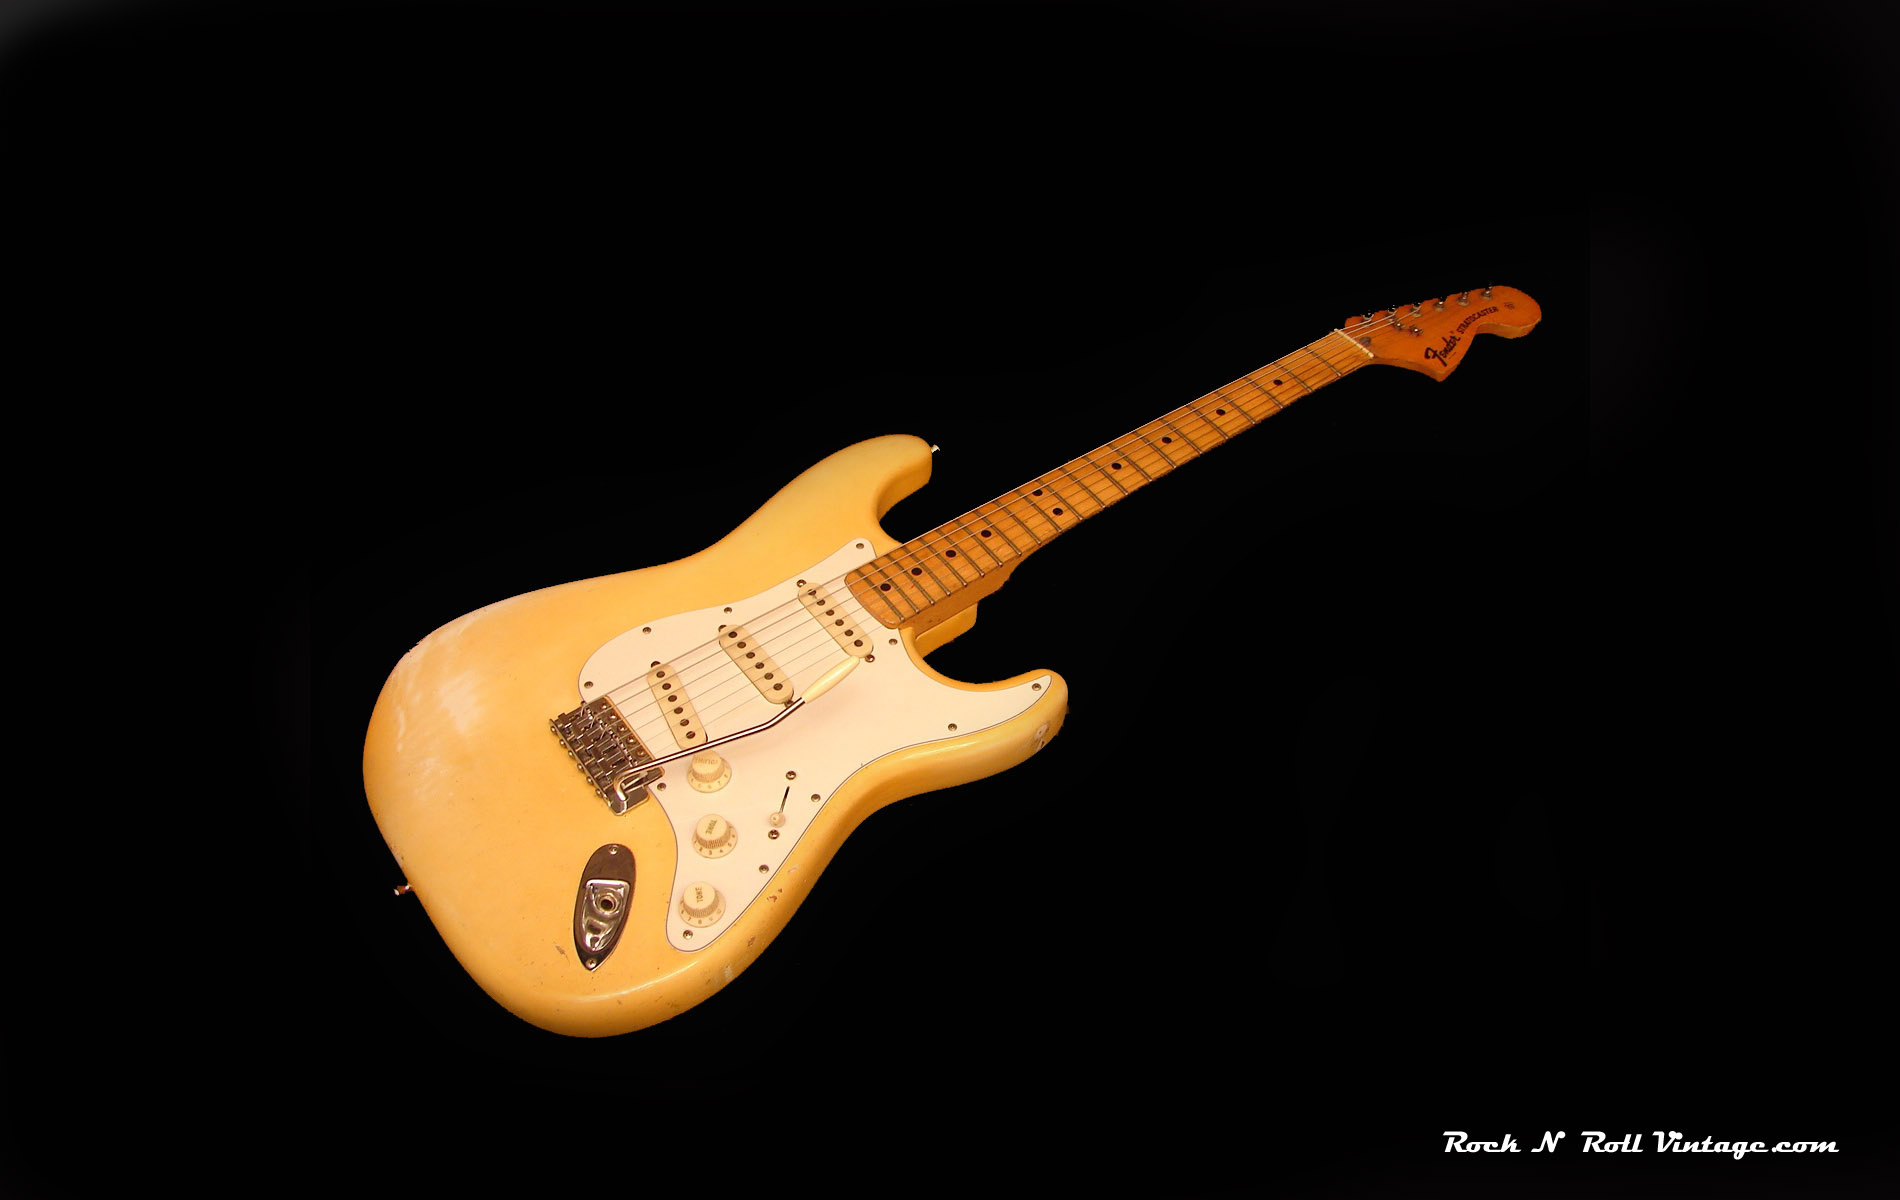 Fender Guitar Wallpaper for Computer 1900x1200